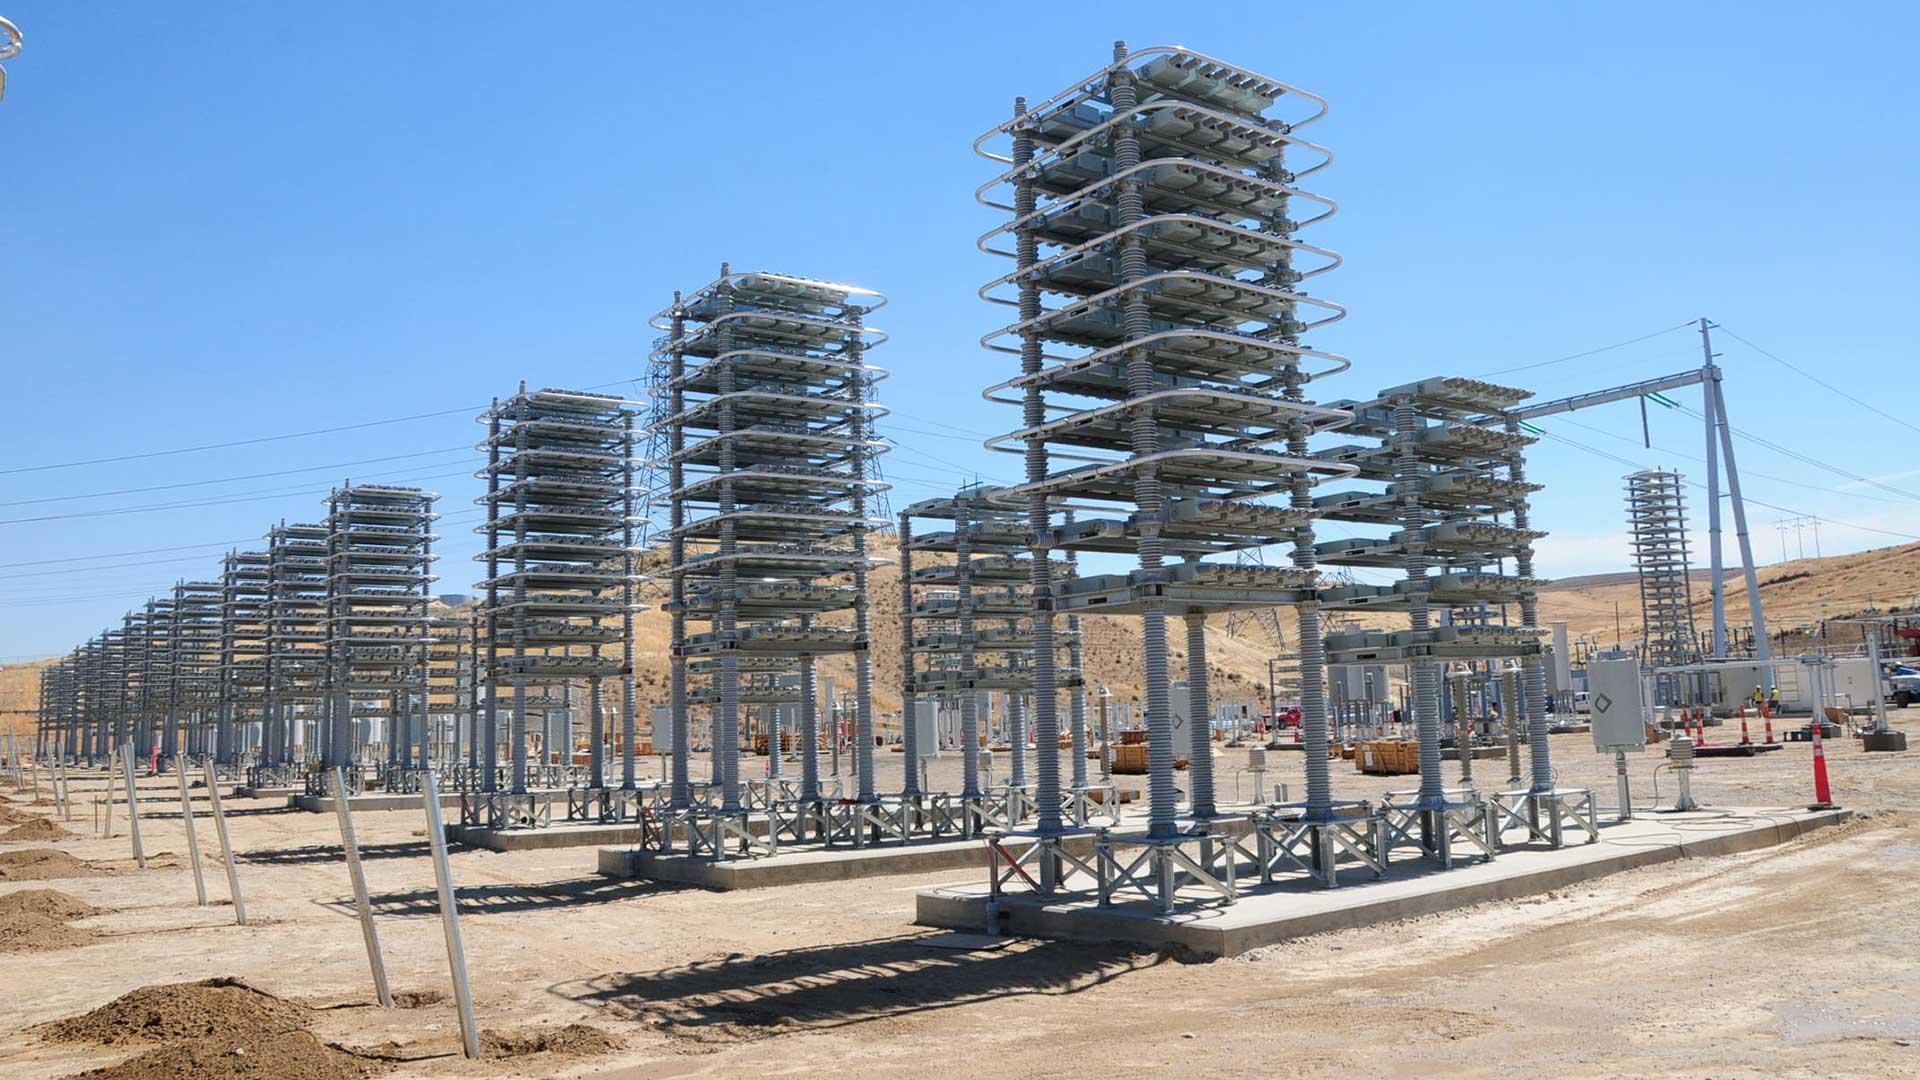 Celilo DC Converter Station - construction